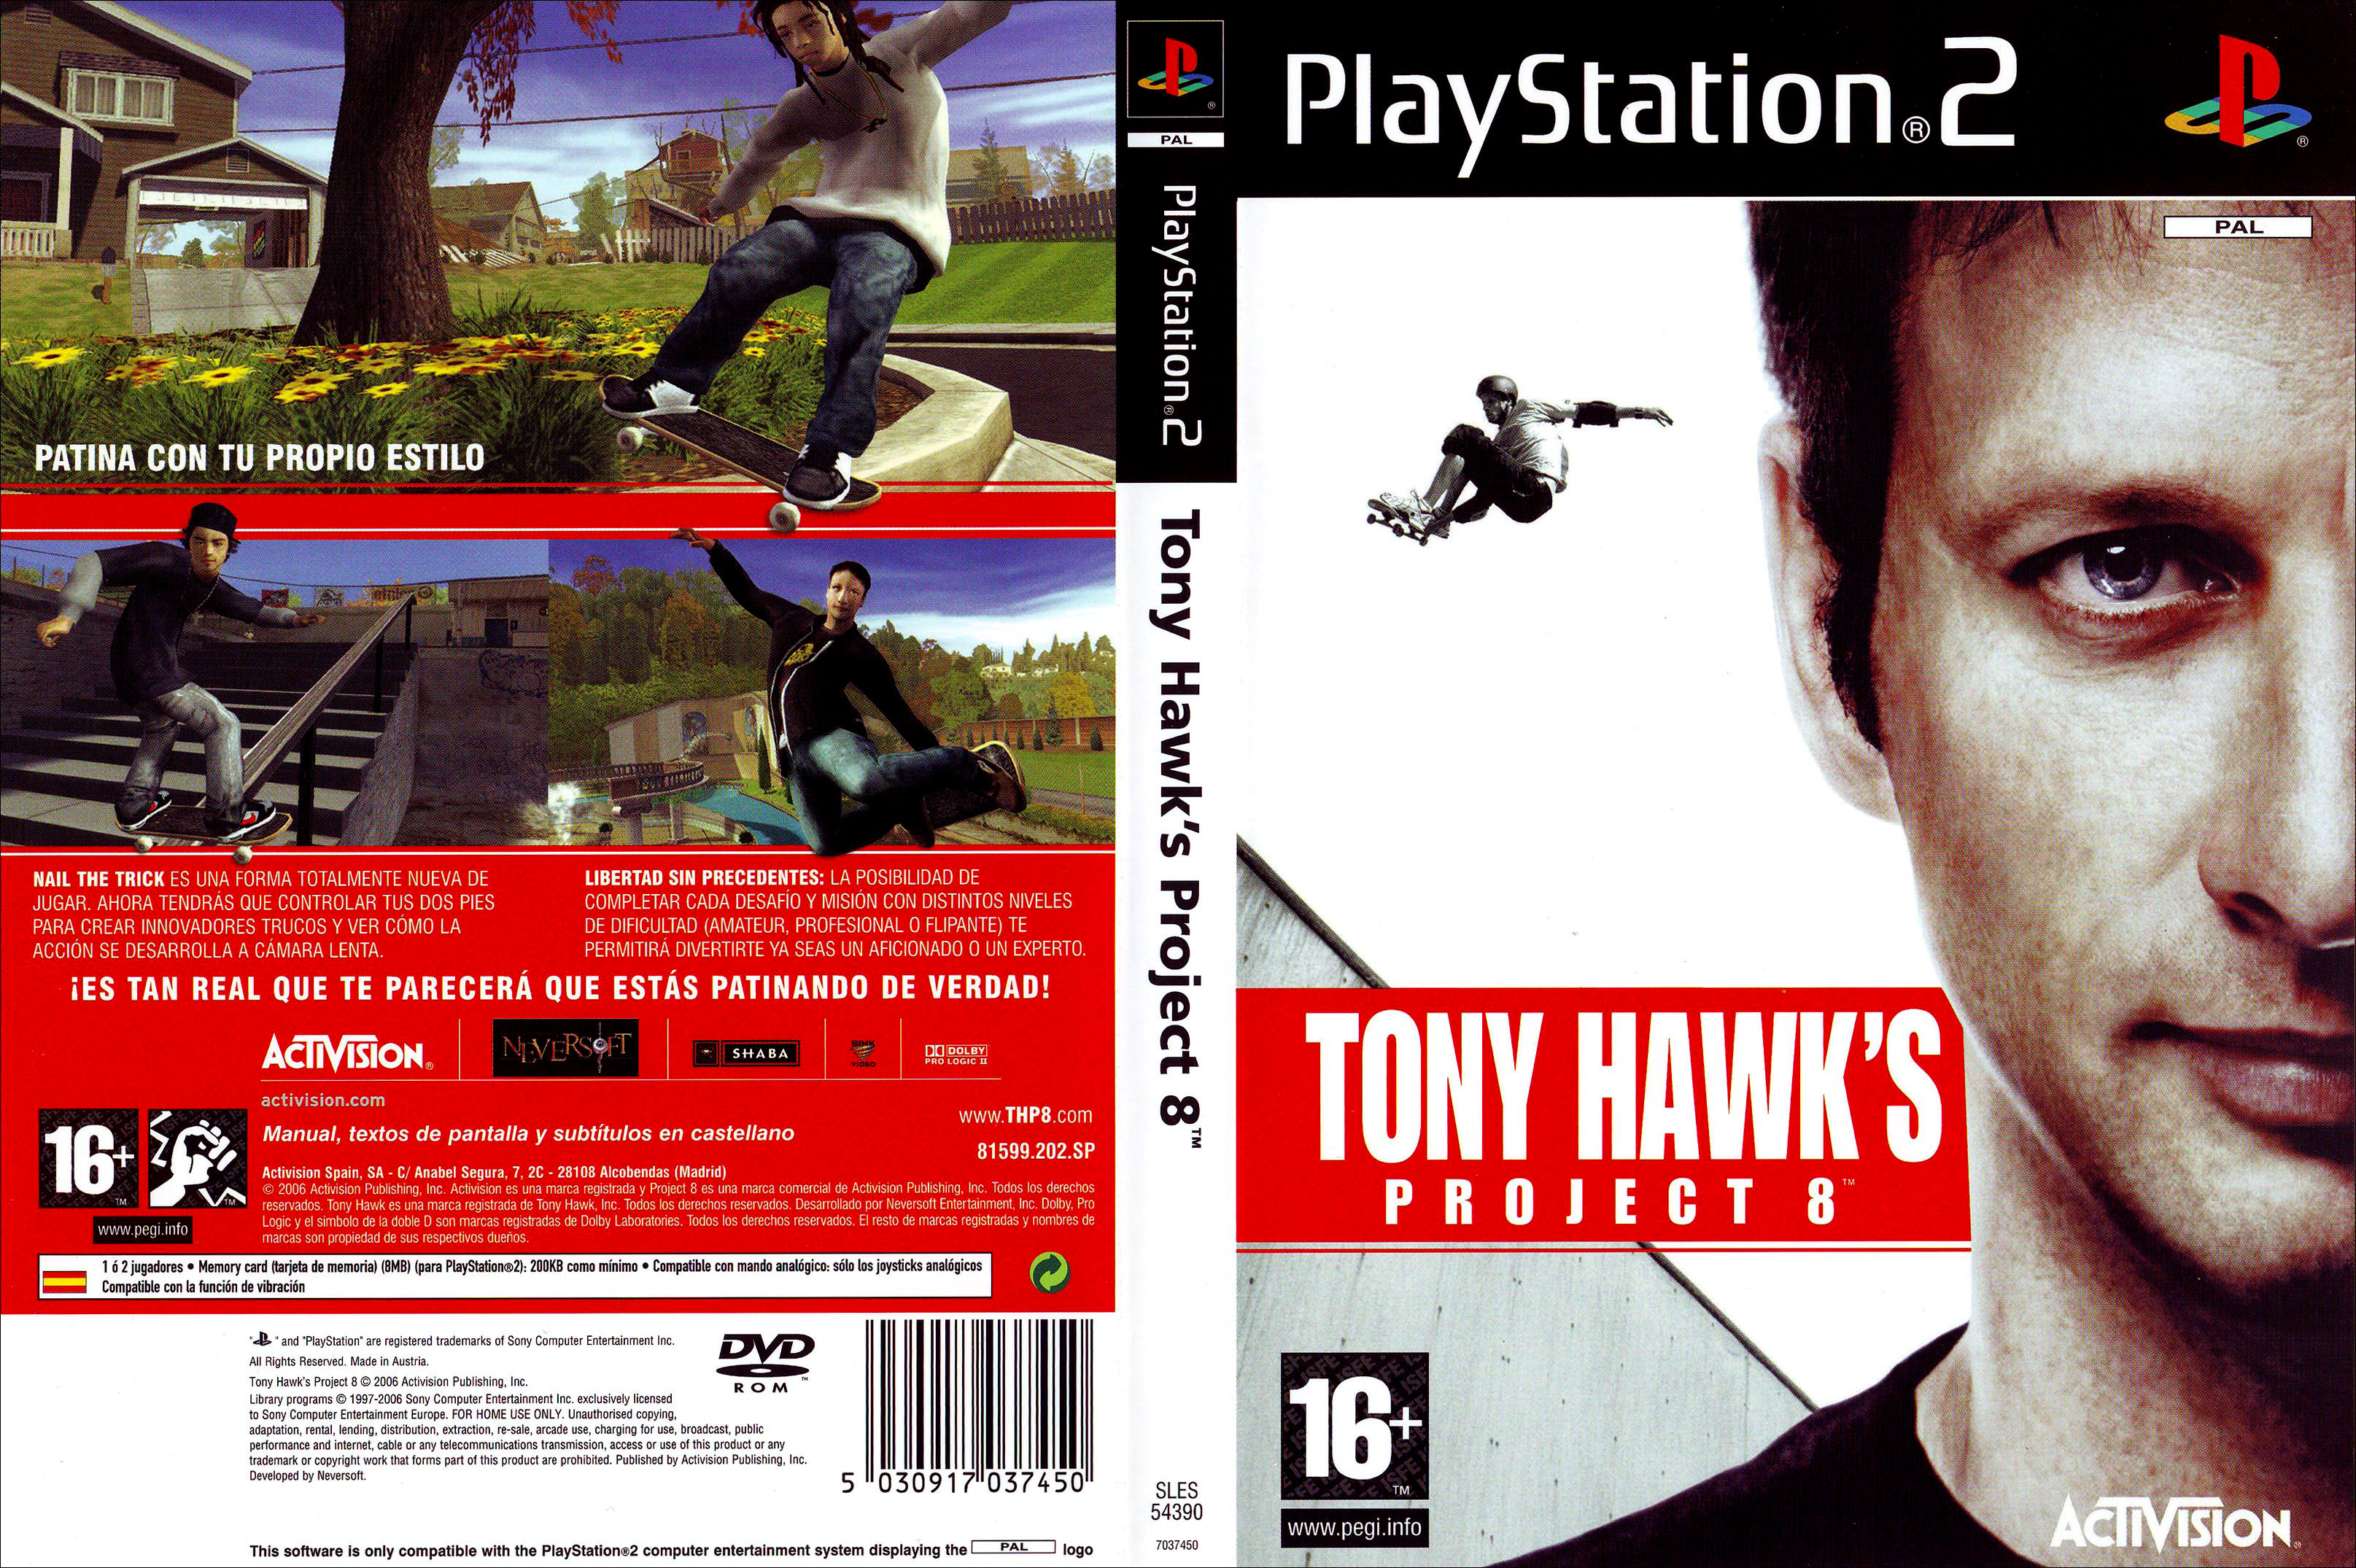 TonyHawksProject8